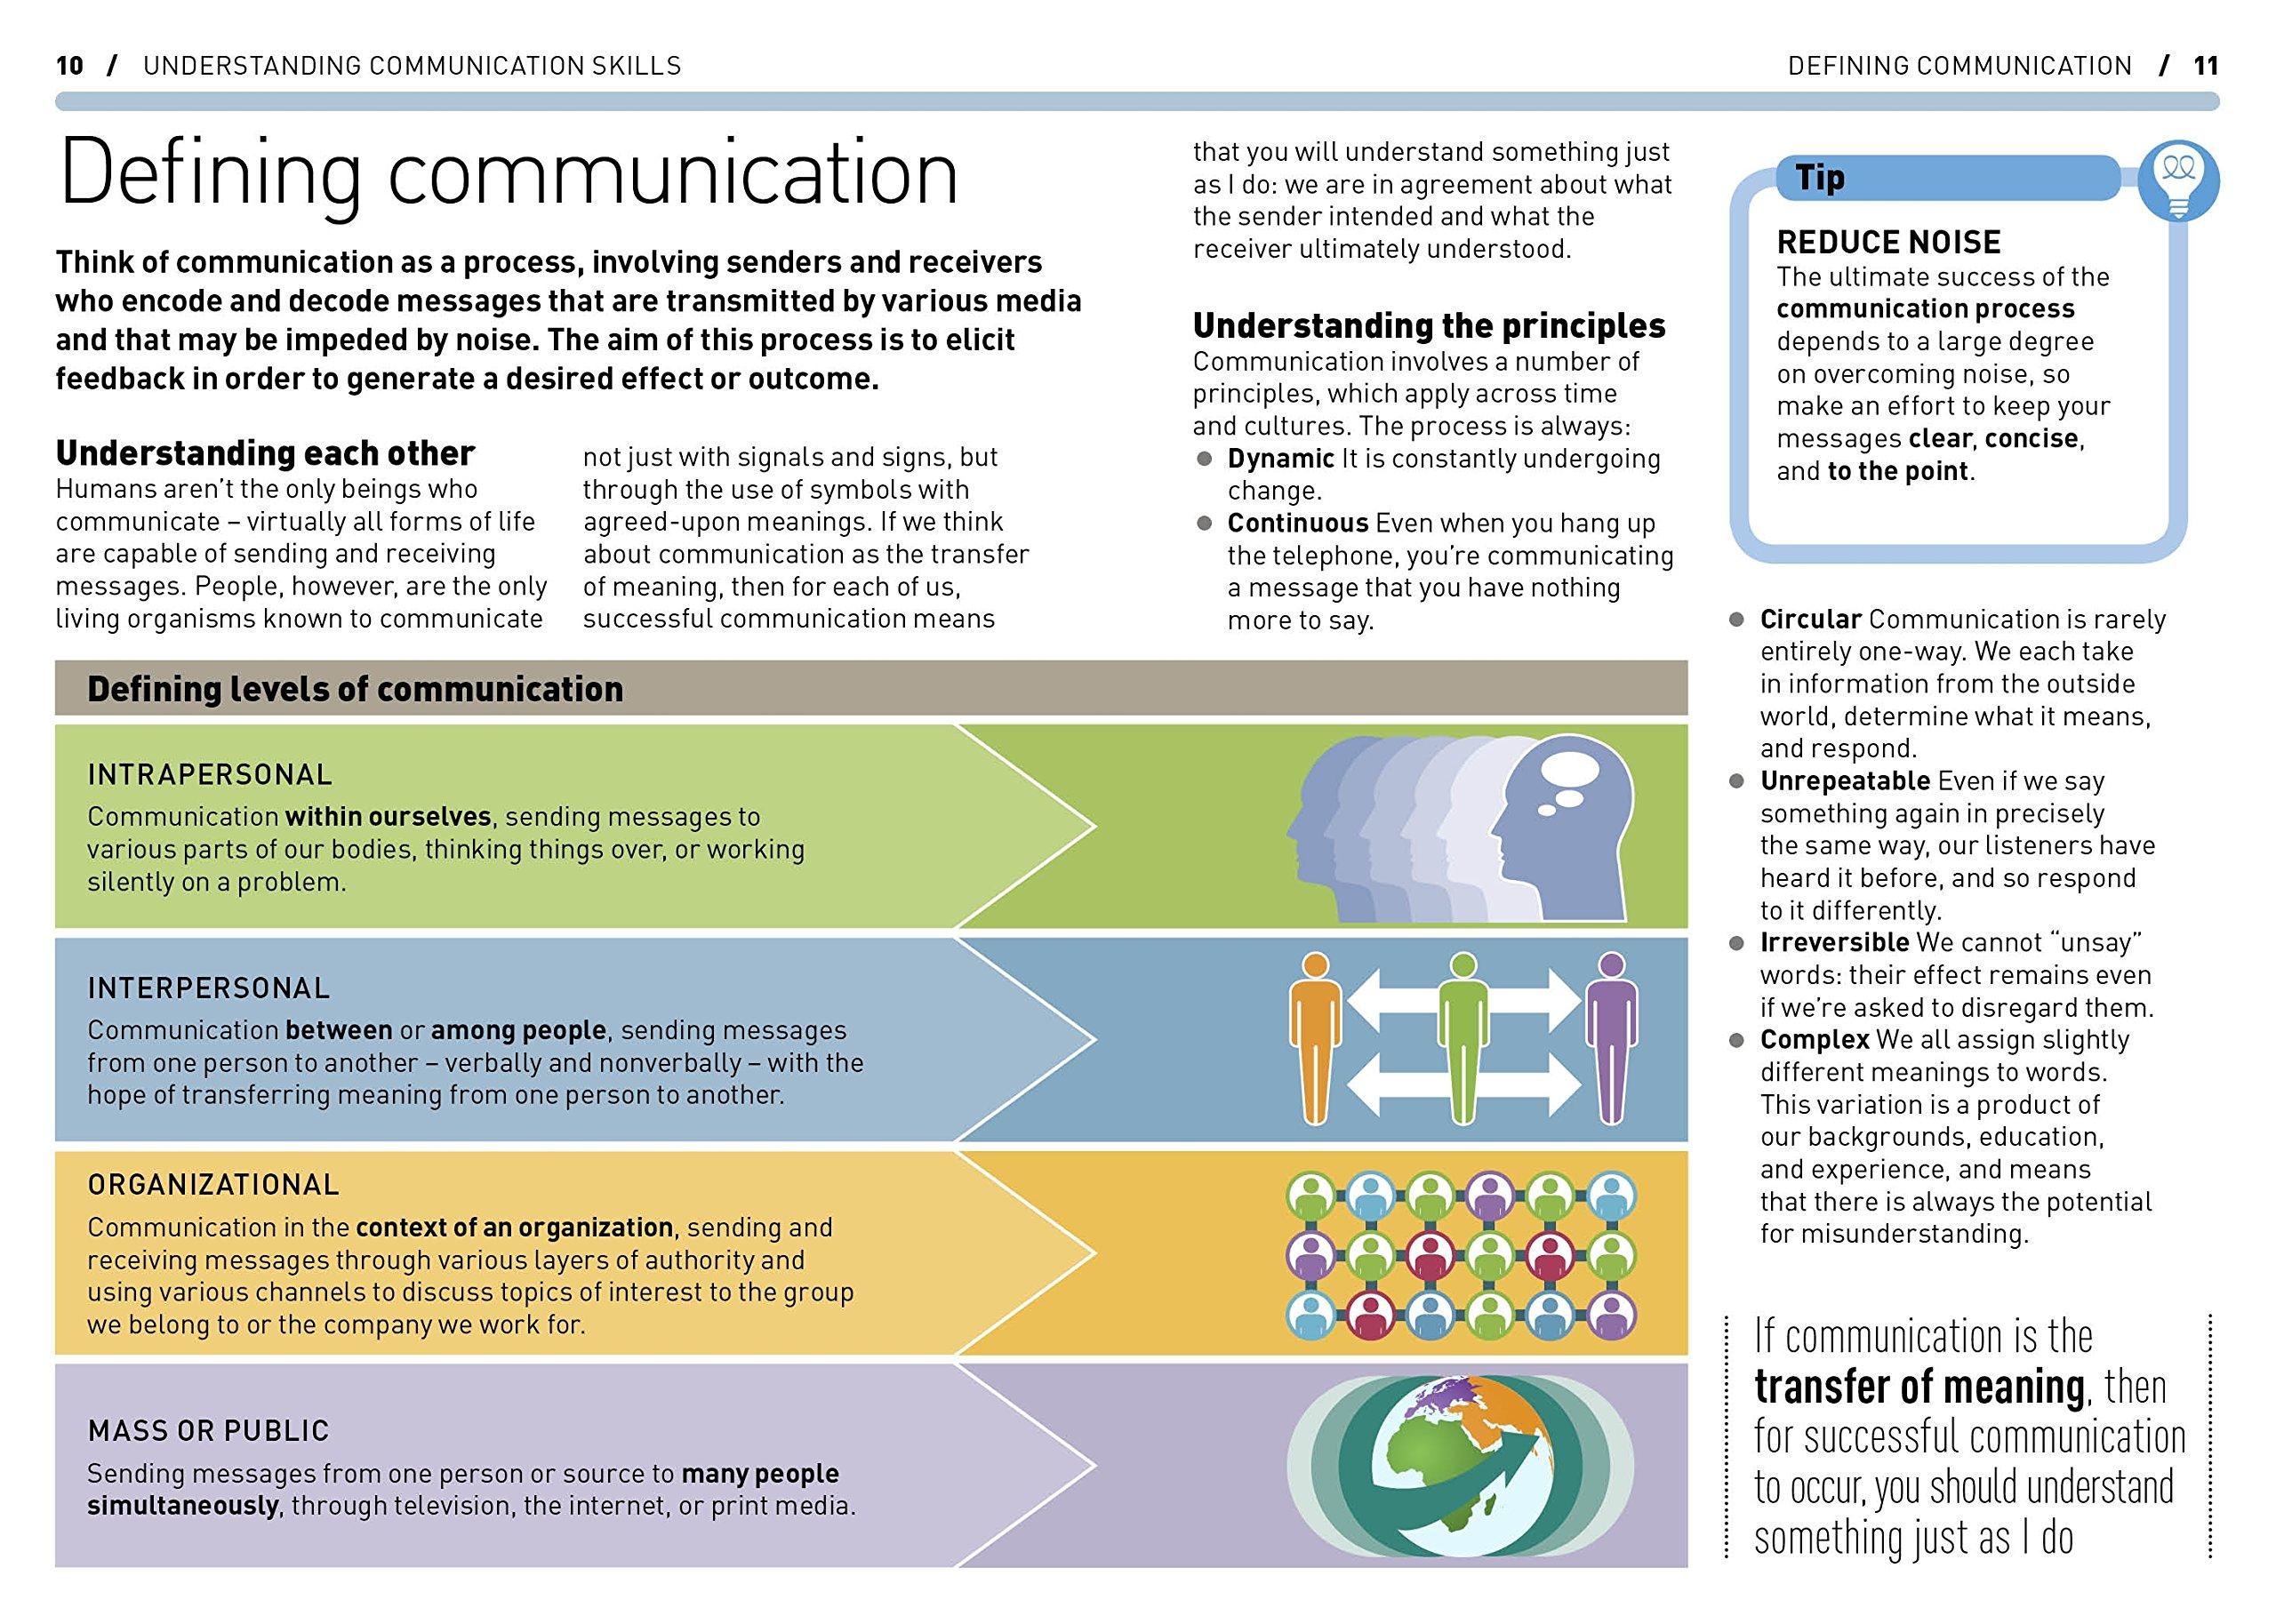 intrapersonal communication skills definition